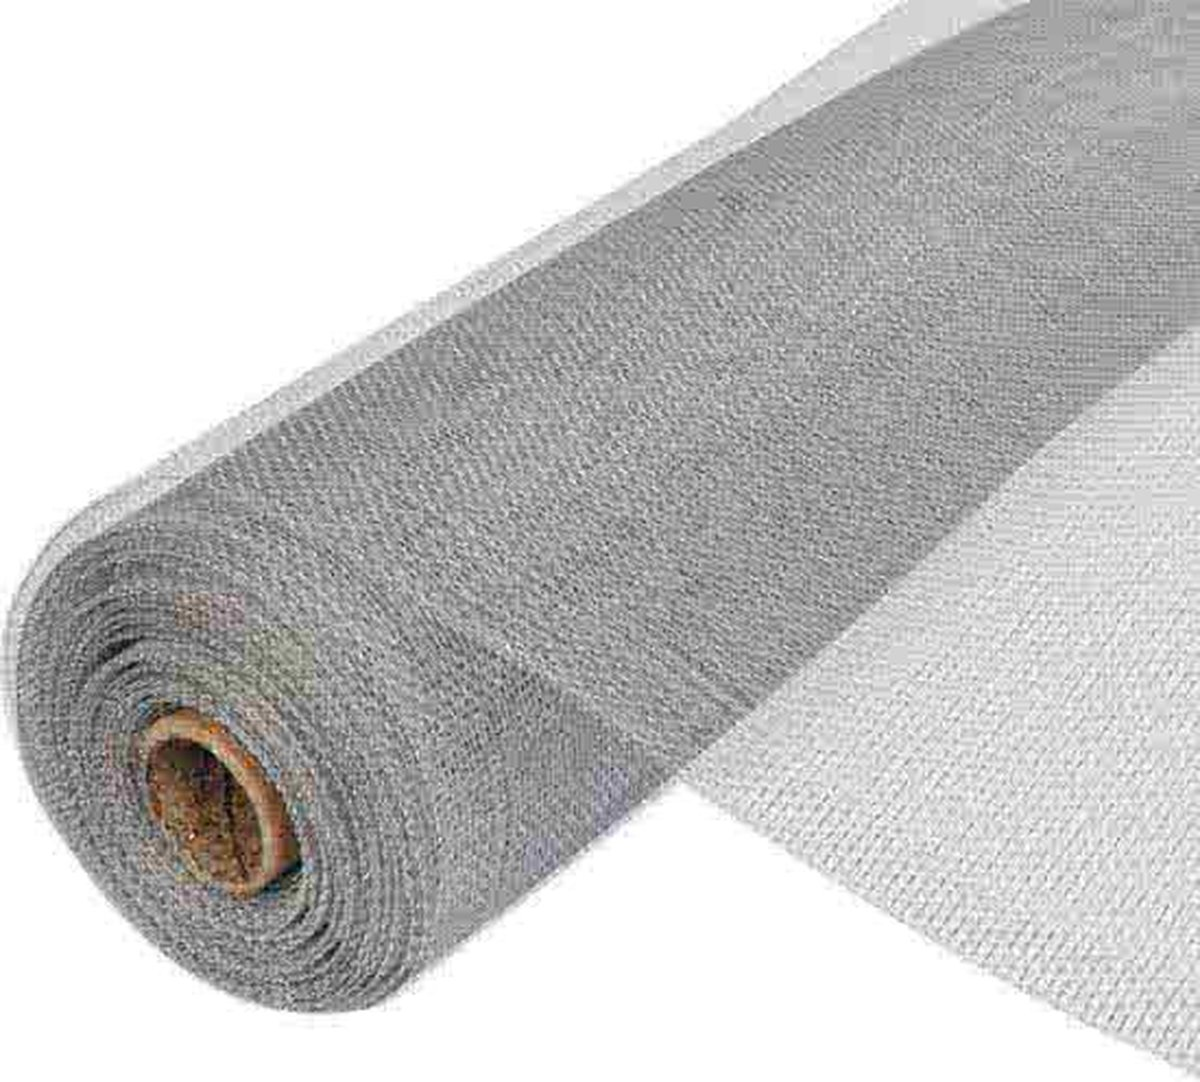 Aluminium horrengaas 1,2x15m maaswijdte 18x16 - Schadébo Professioneel